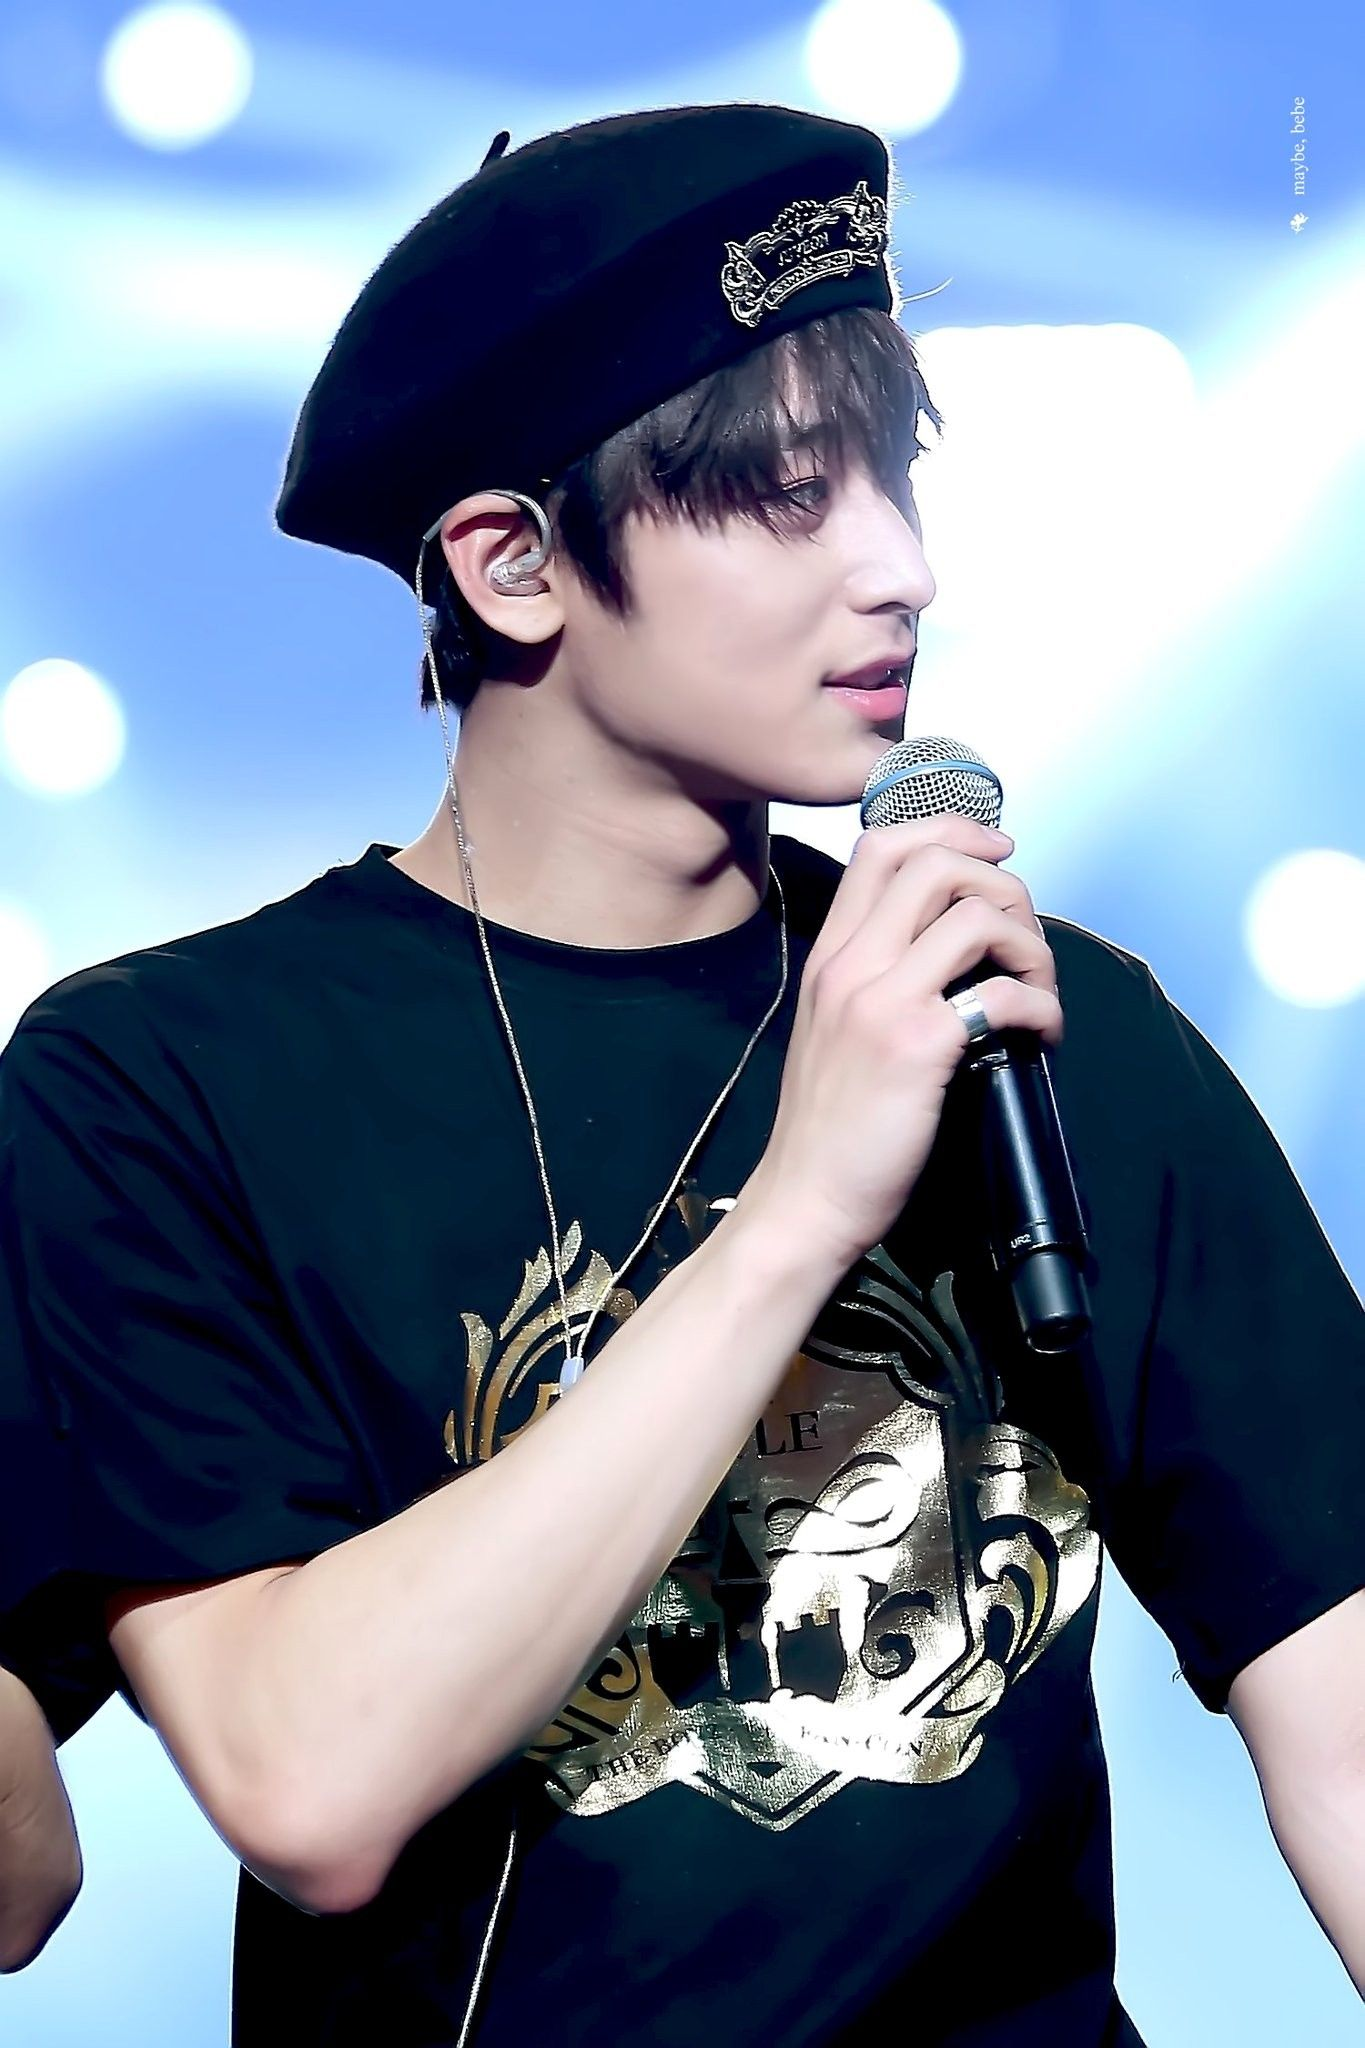 Lee JuYeon 💗 THE BOYZ | Pop singers, Handsome boys, Singer